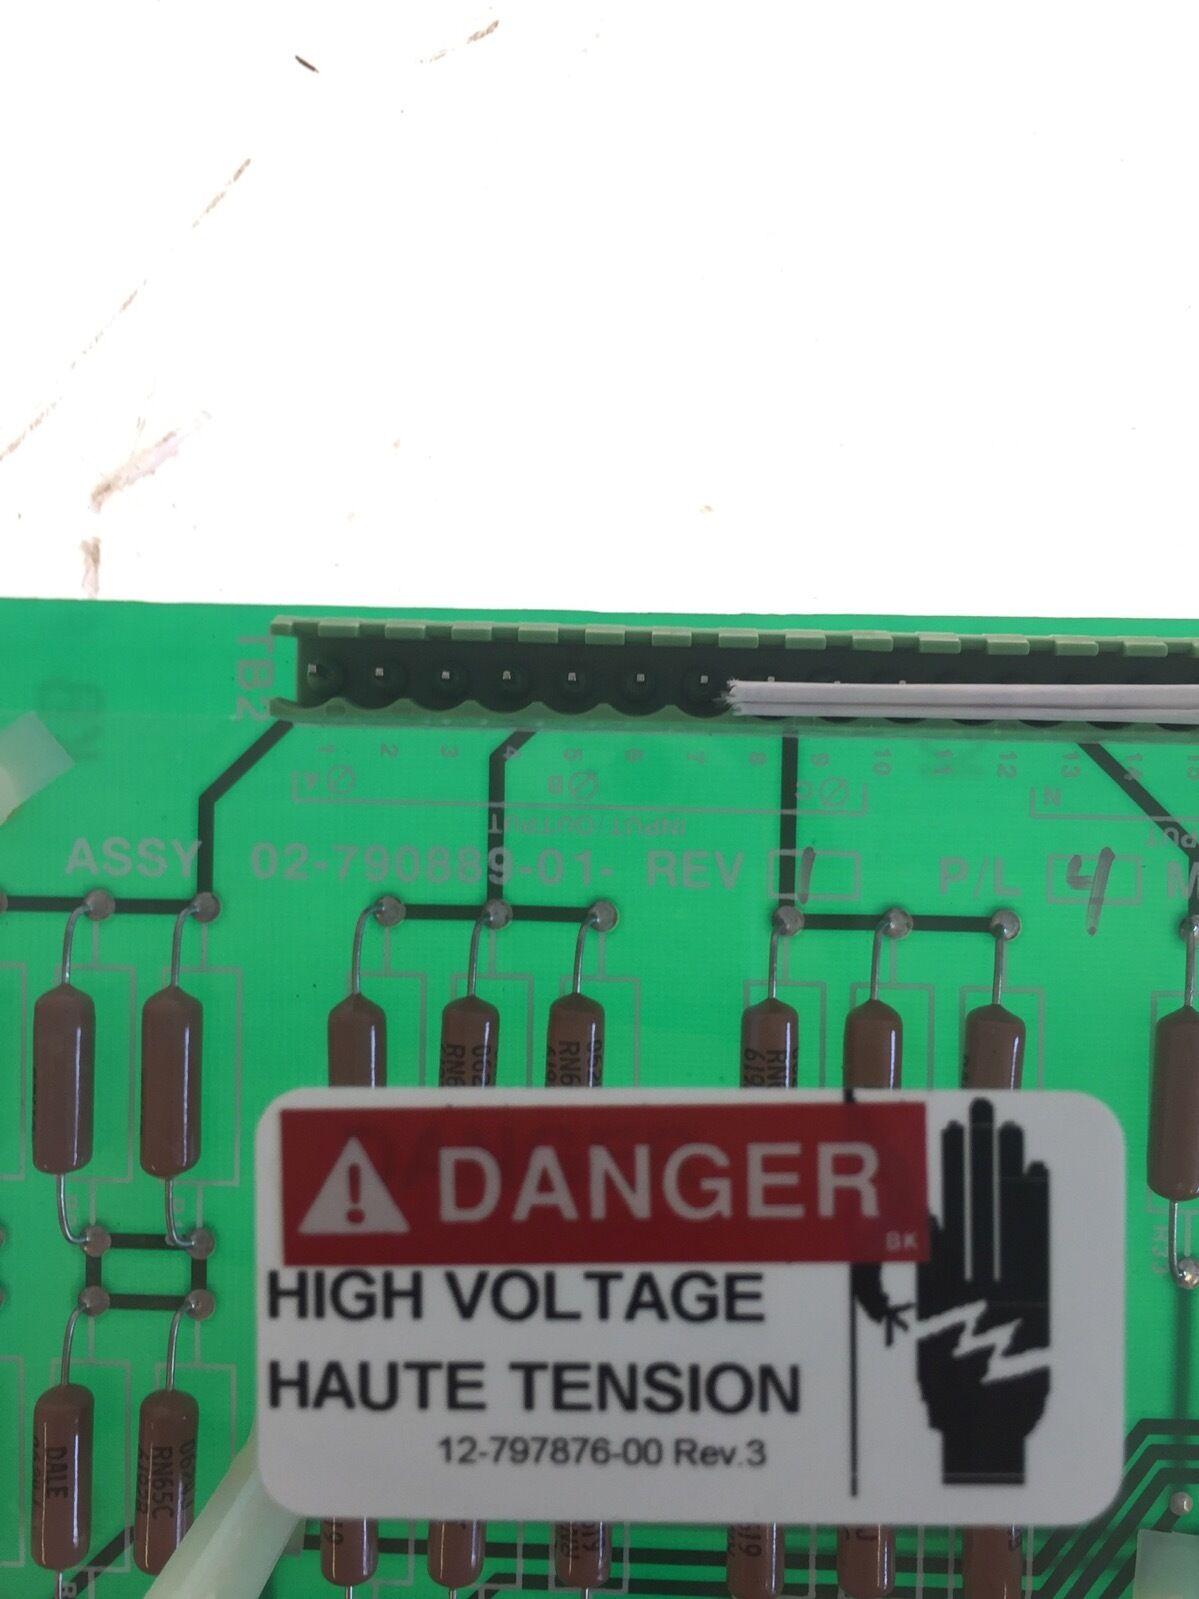 Nuevo Emerson Emerson Emerson Liebert 02-790889-01 Rev 1 V & I Acondicionador de placa de circuito, (B158) 7bc6ff